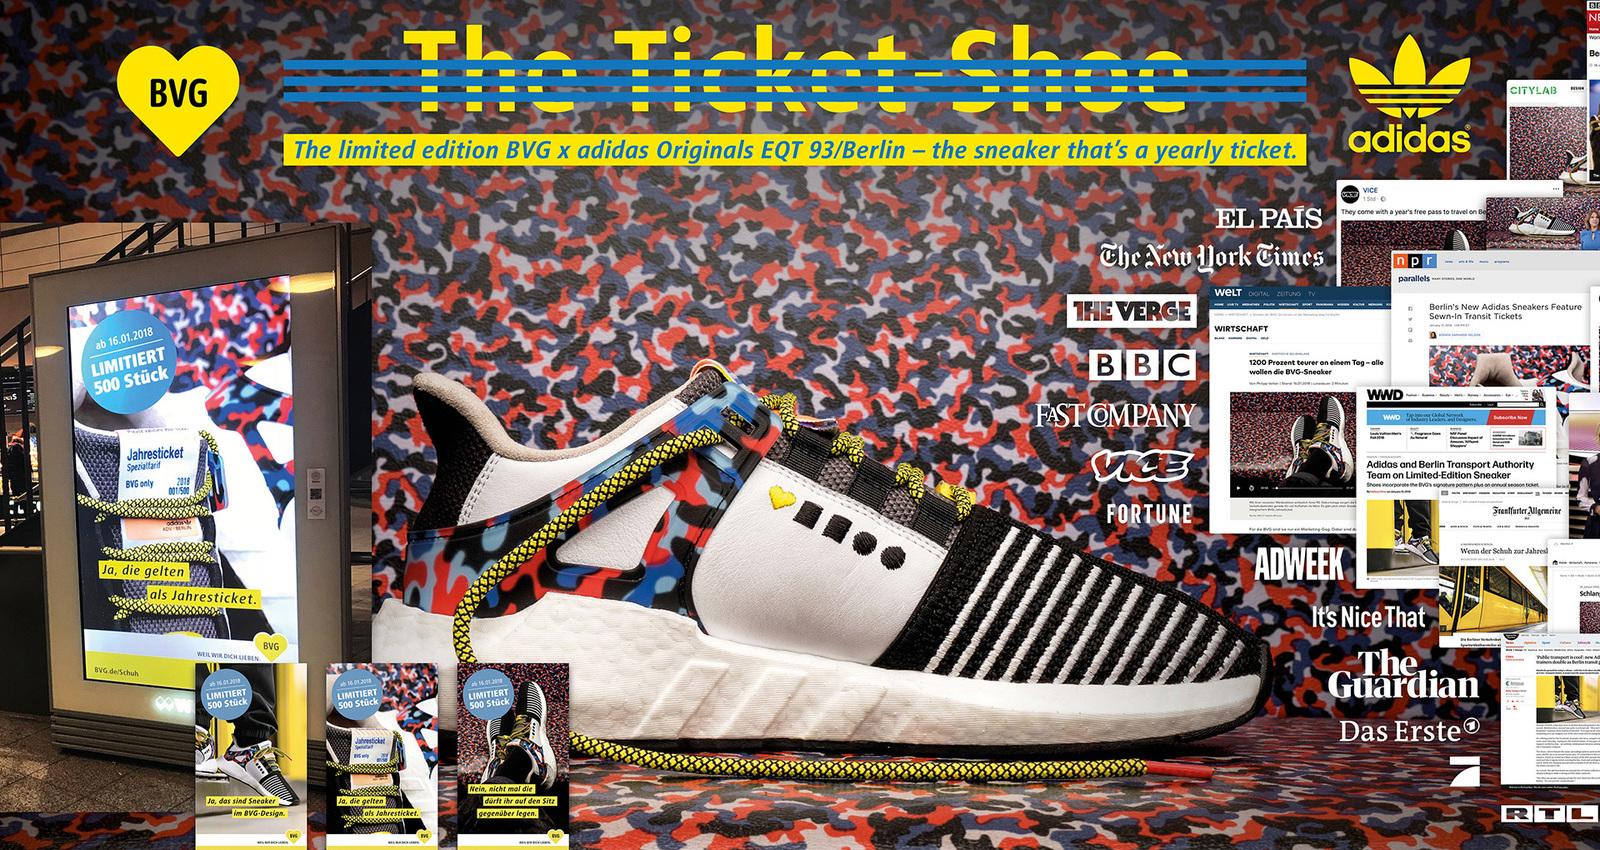 BVG x adidas – The Ticket-Shoe